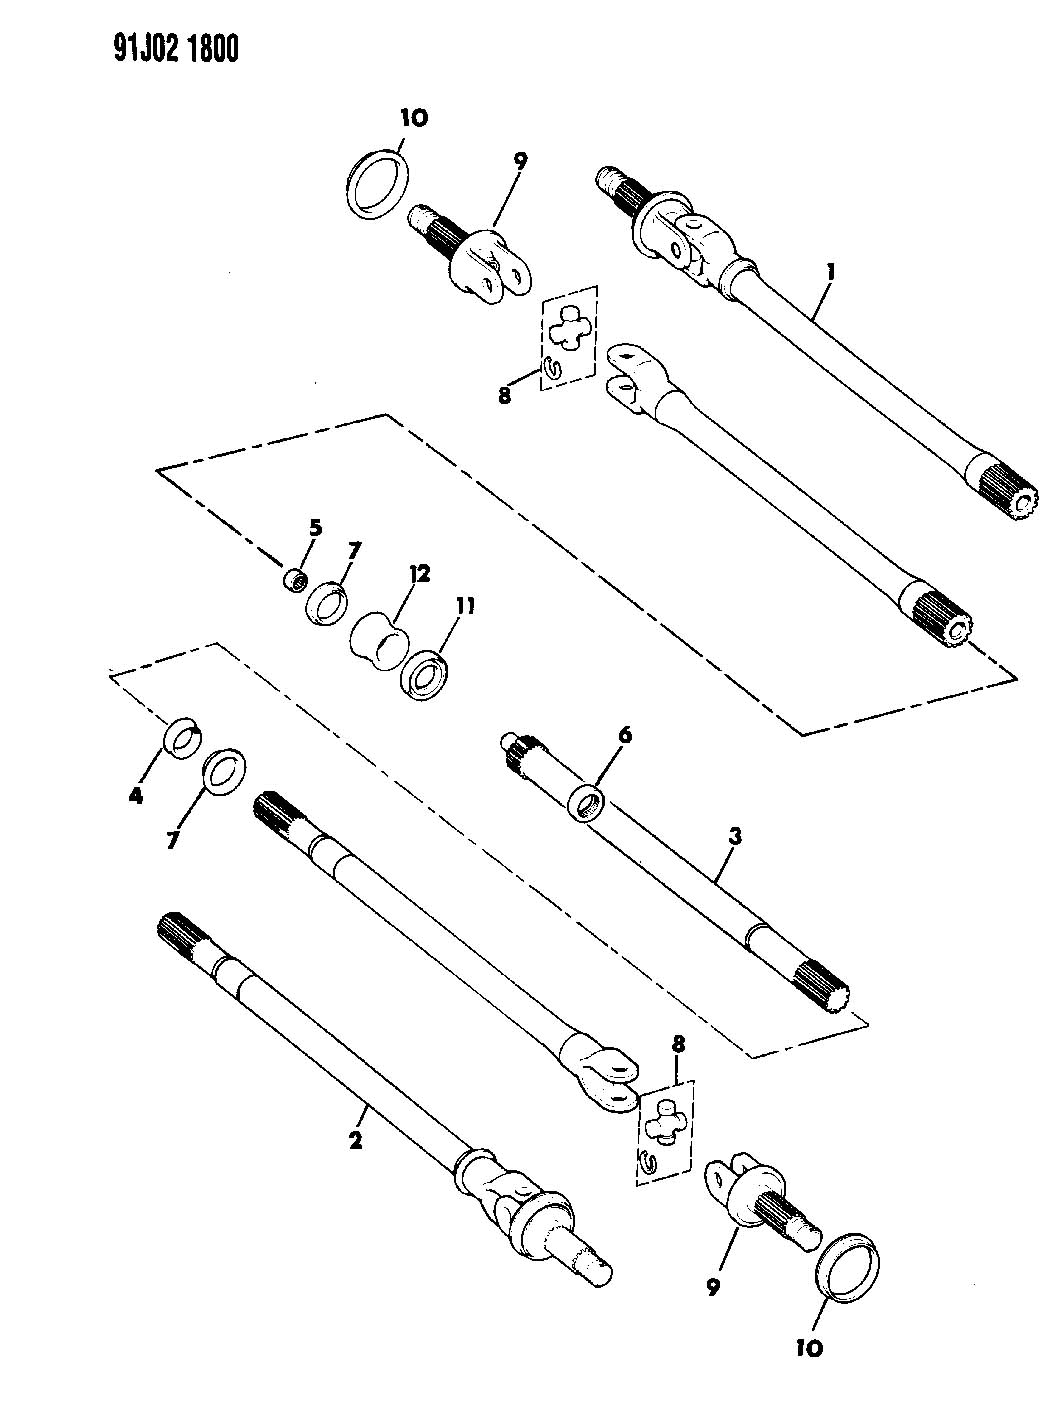 1987 dodge ram 50 parts